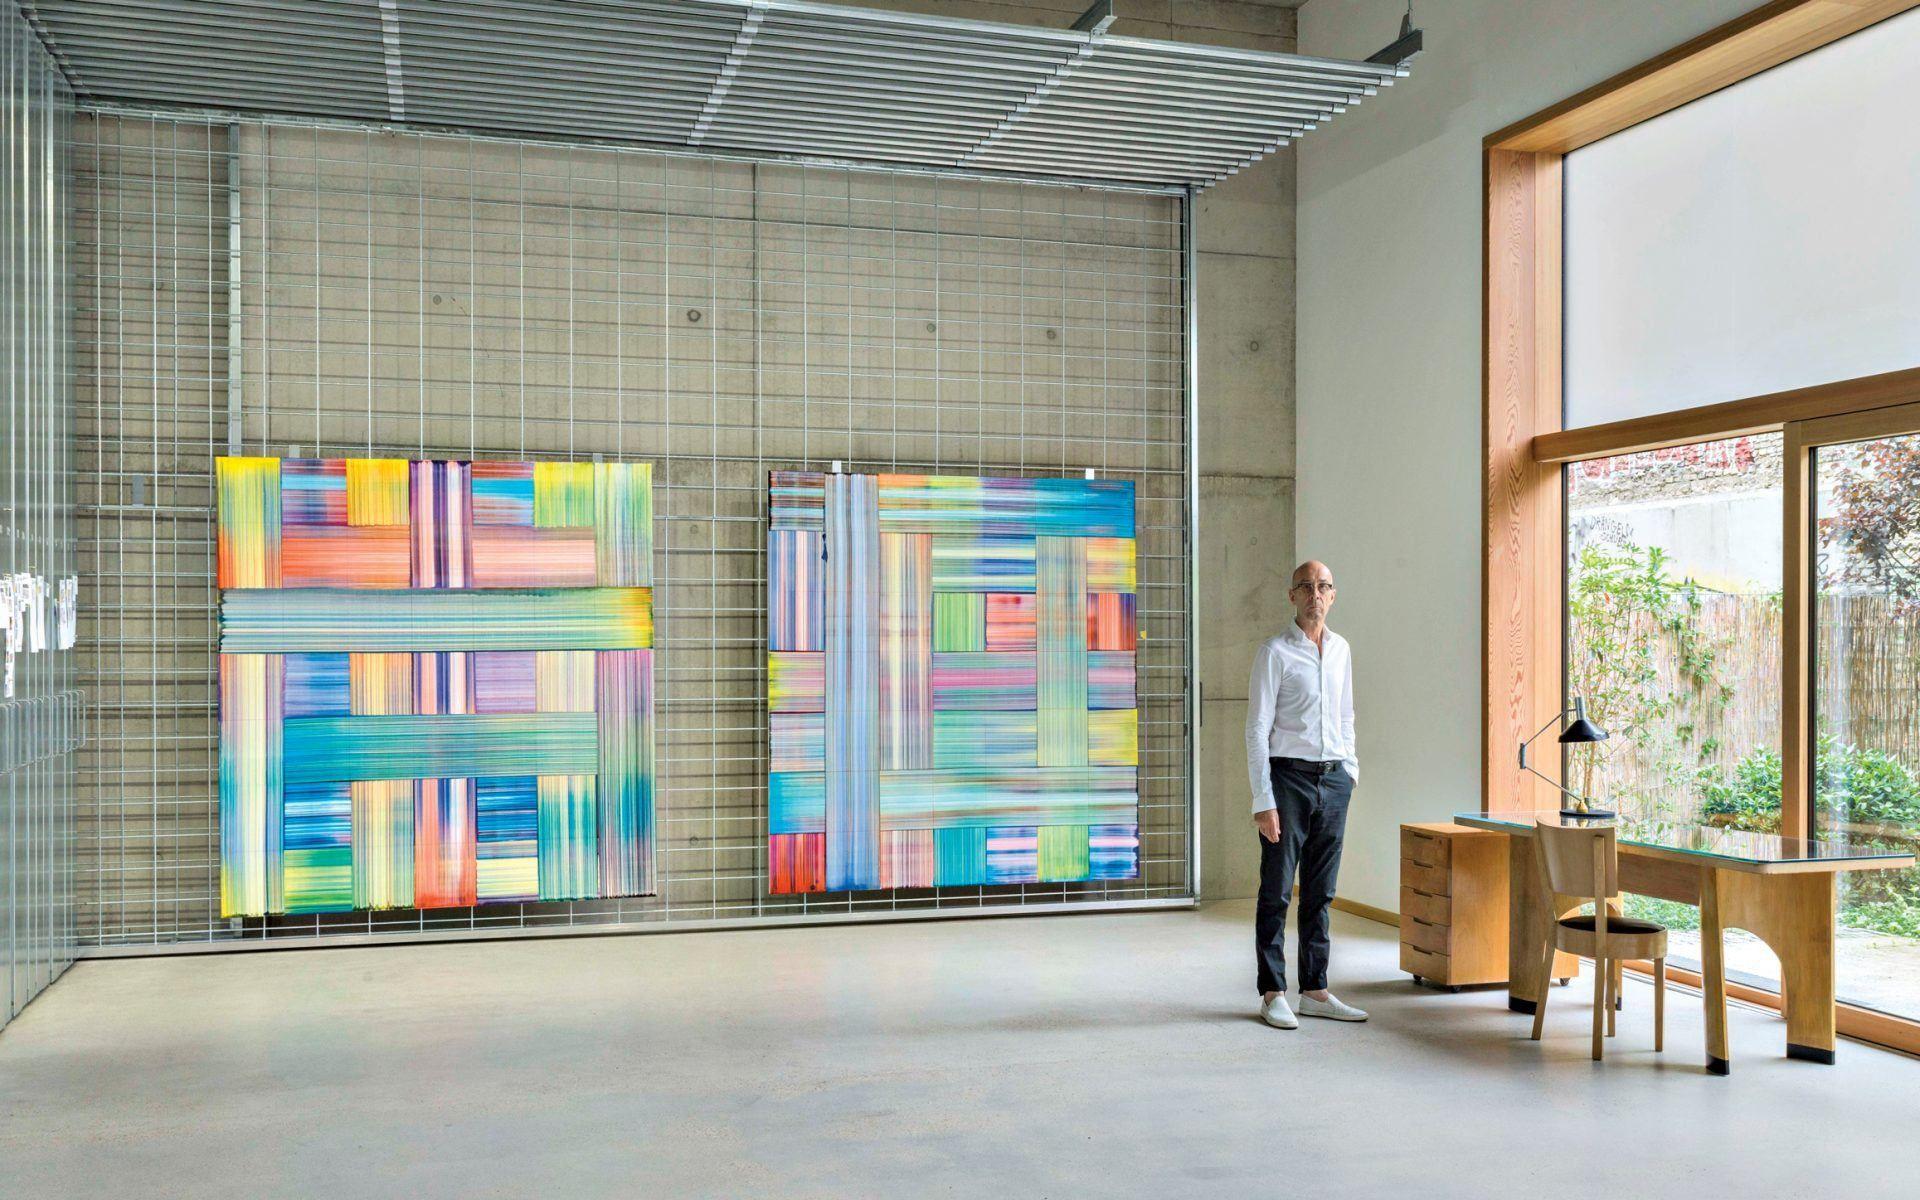 Berlin Gallery Weekend Roundup Wolfgang Tillmans Studio At Galerie Buchholz Mousse Contemporary Art Magaz Wolfgang Tillman Berlin Gallery Gallery Weekend